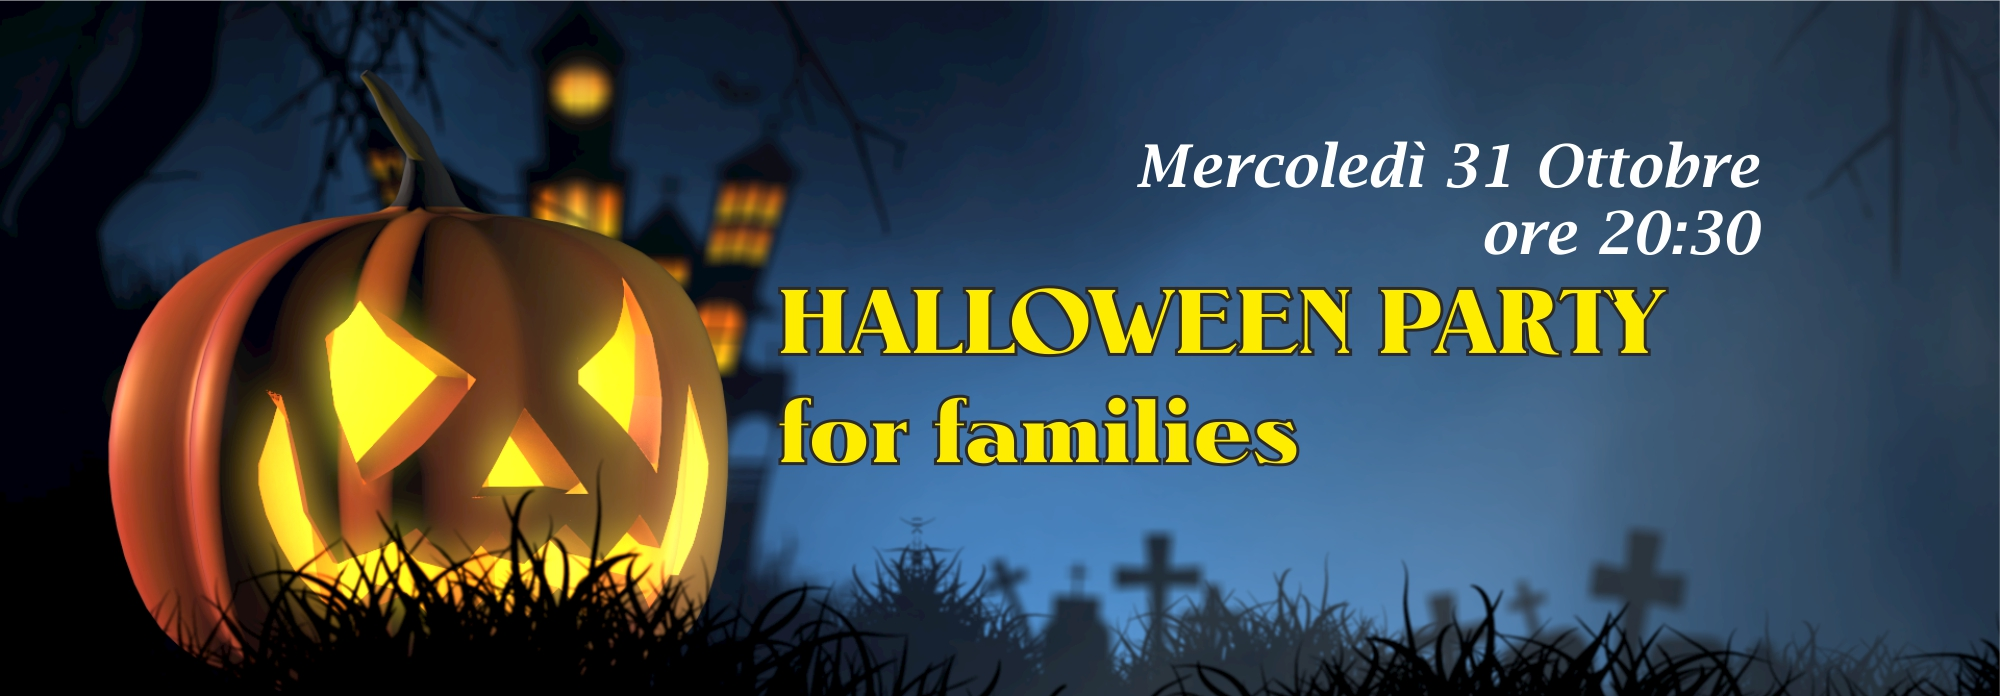 <a href='http://www.allasicilia.it/halloween/'></a>